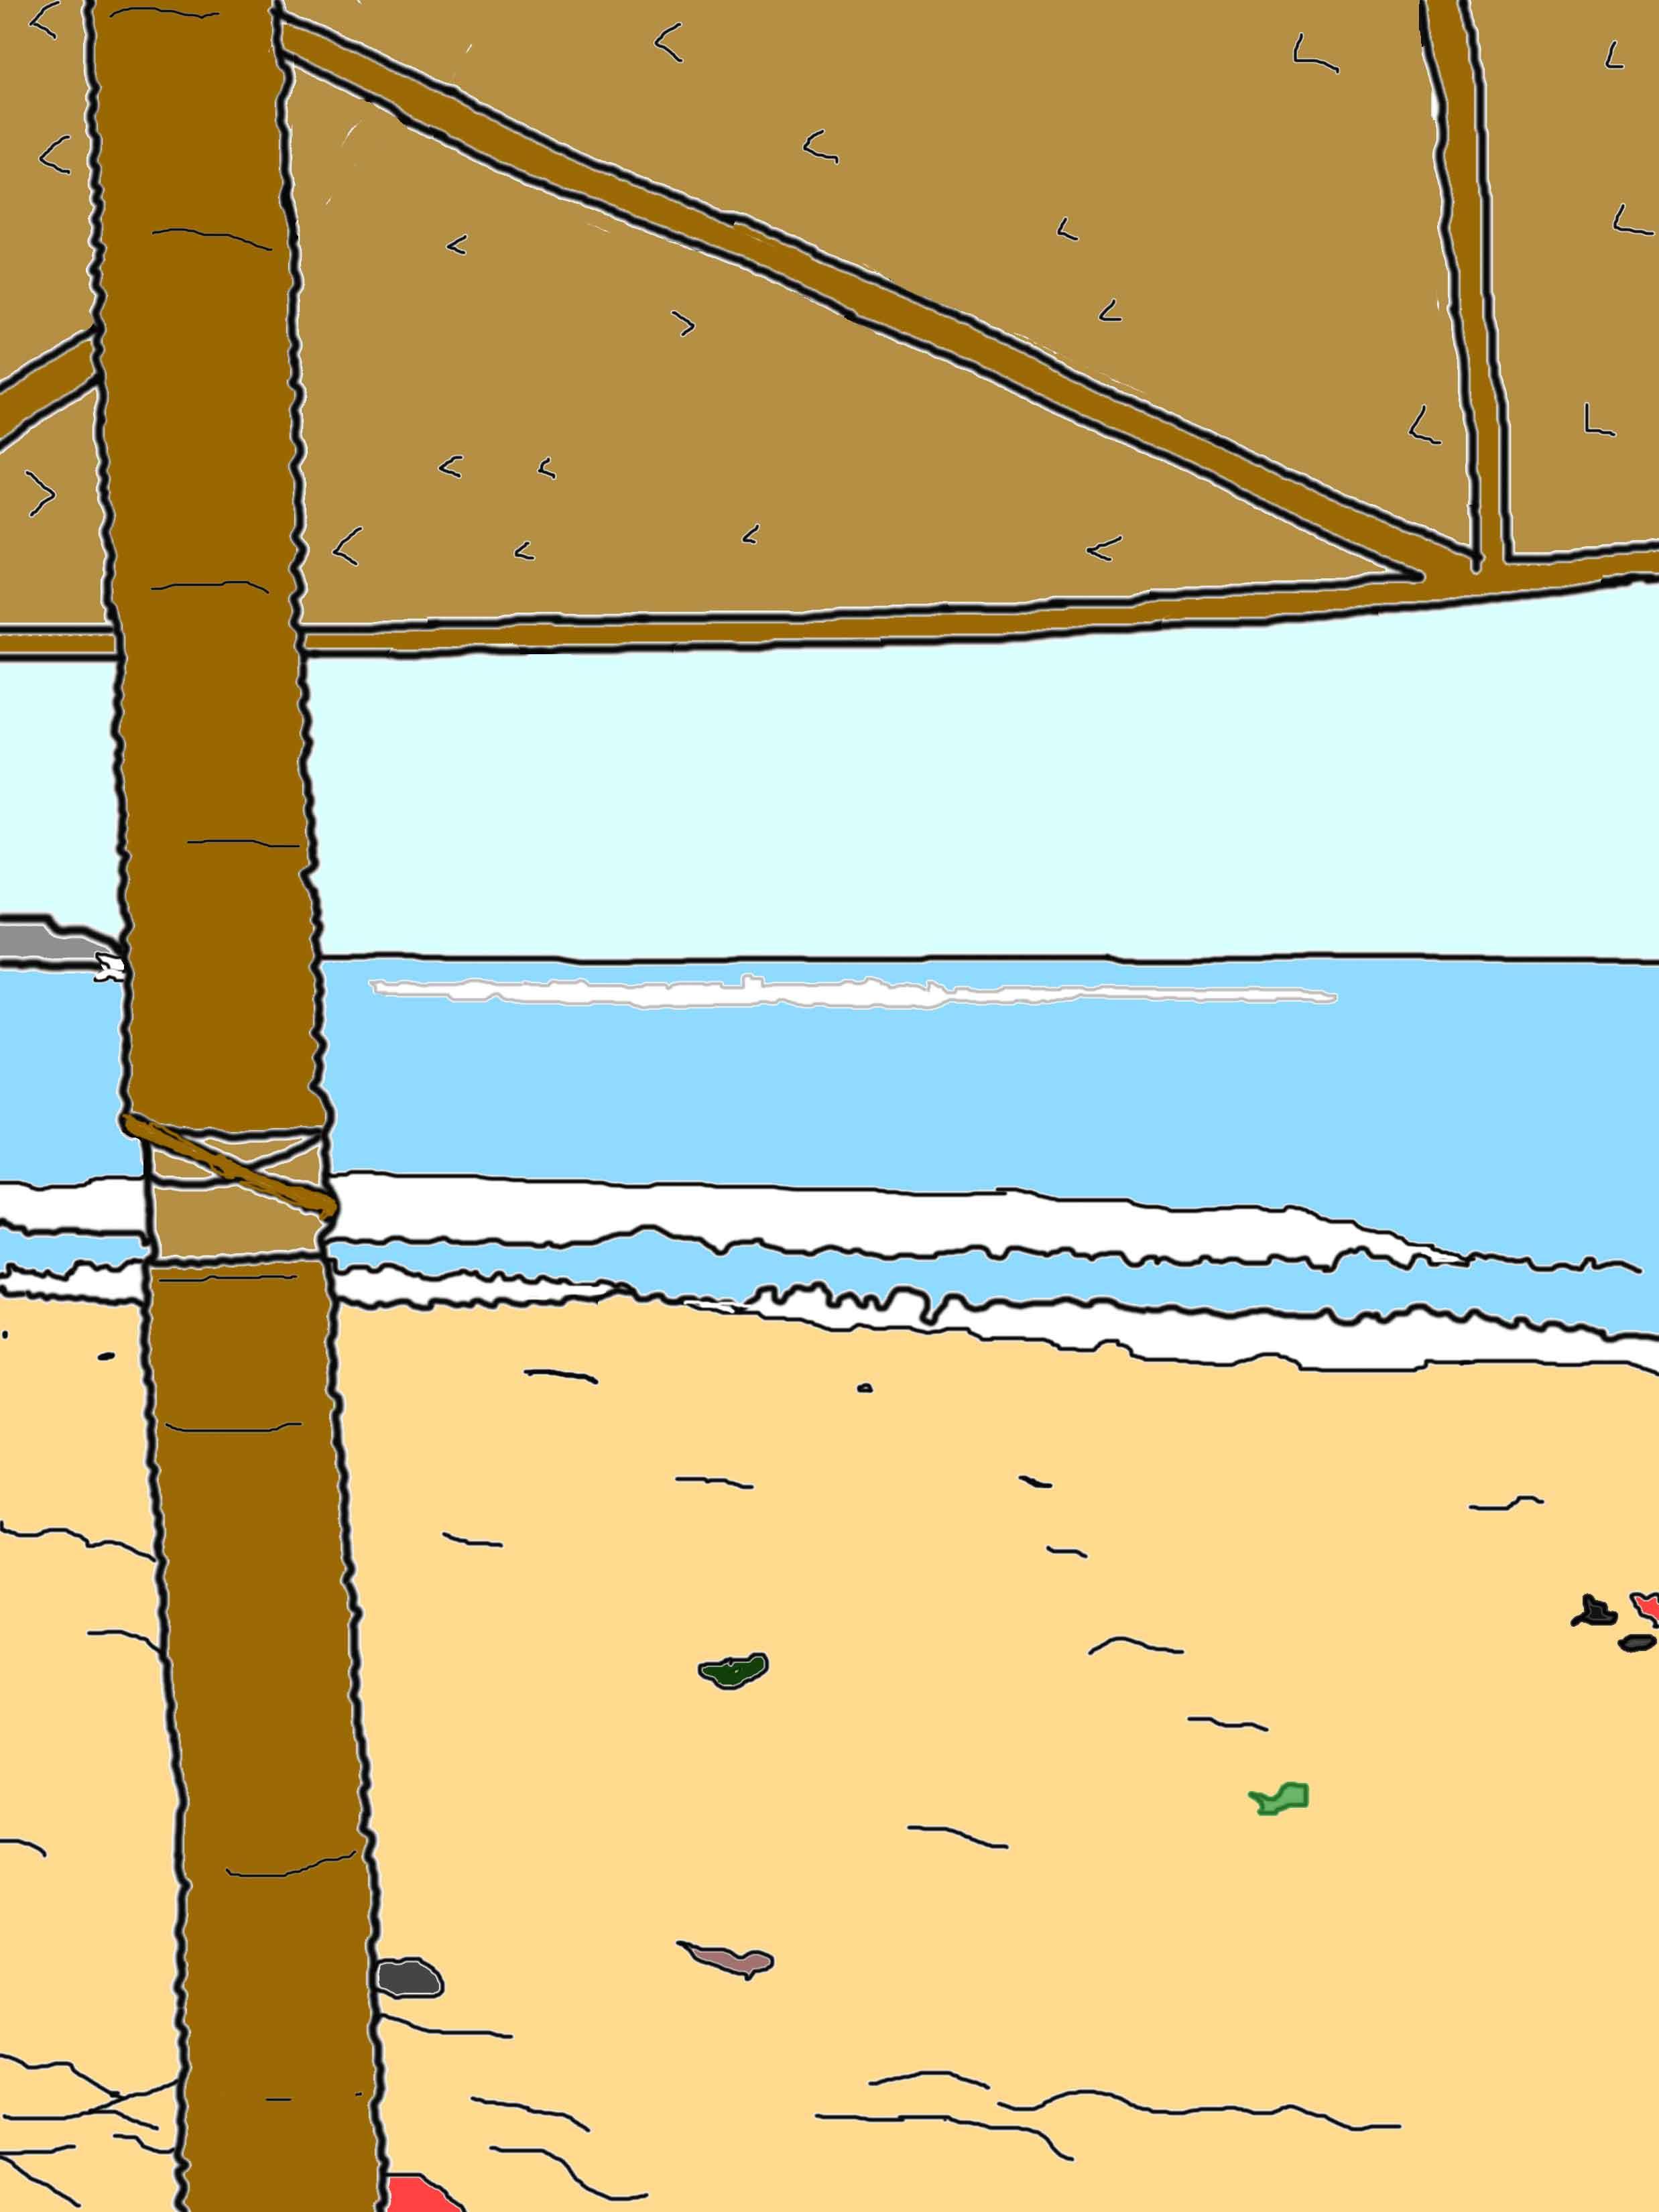 Beach umbrella drawing colored.